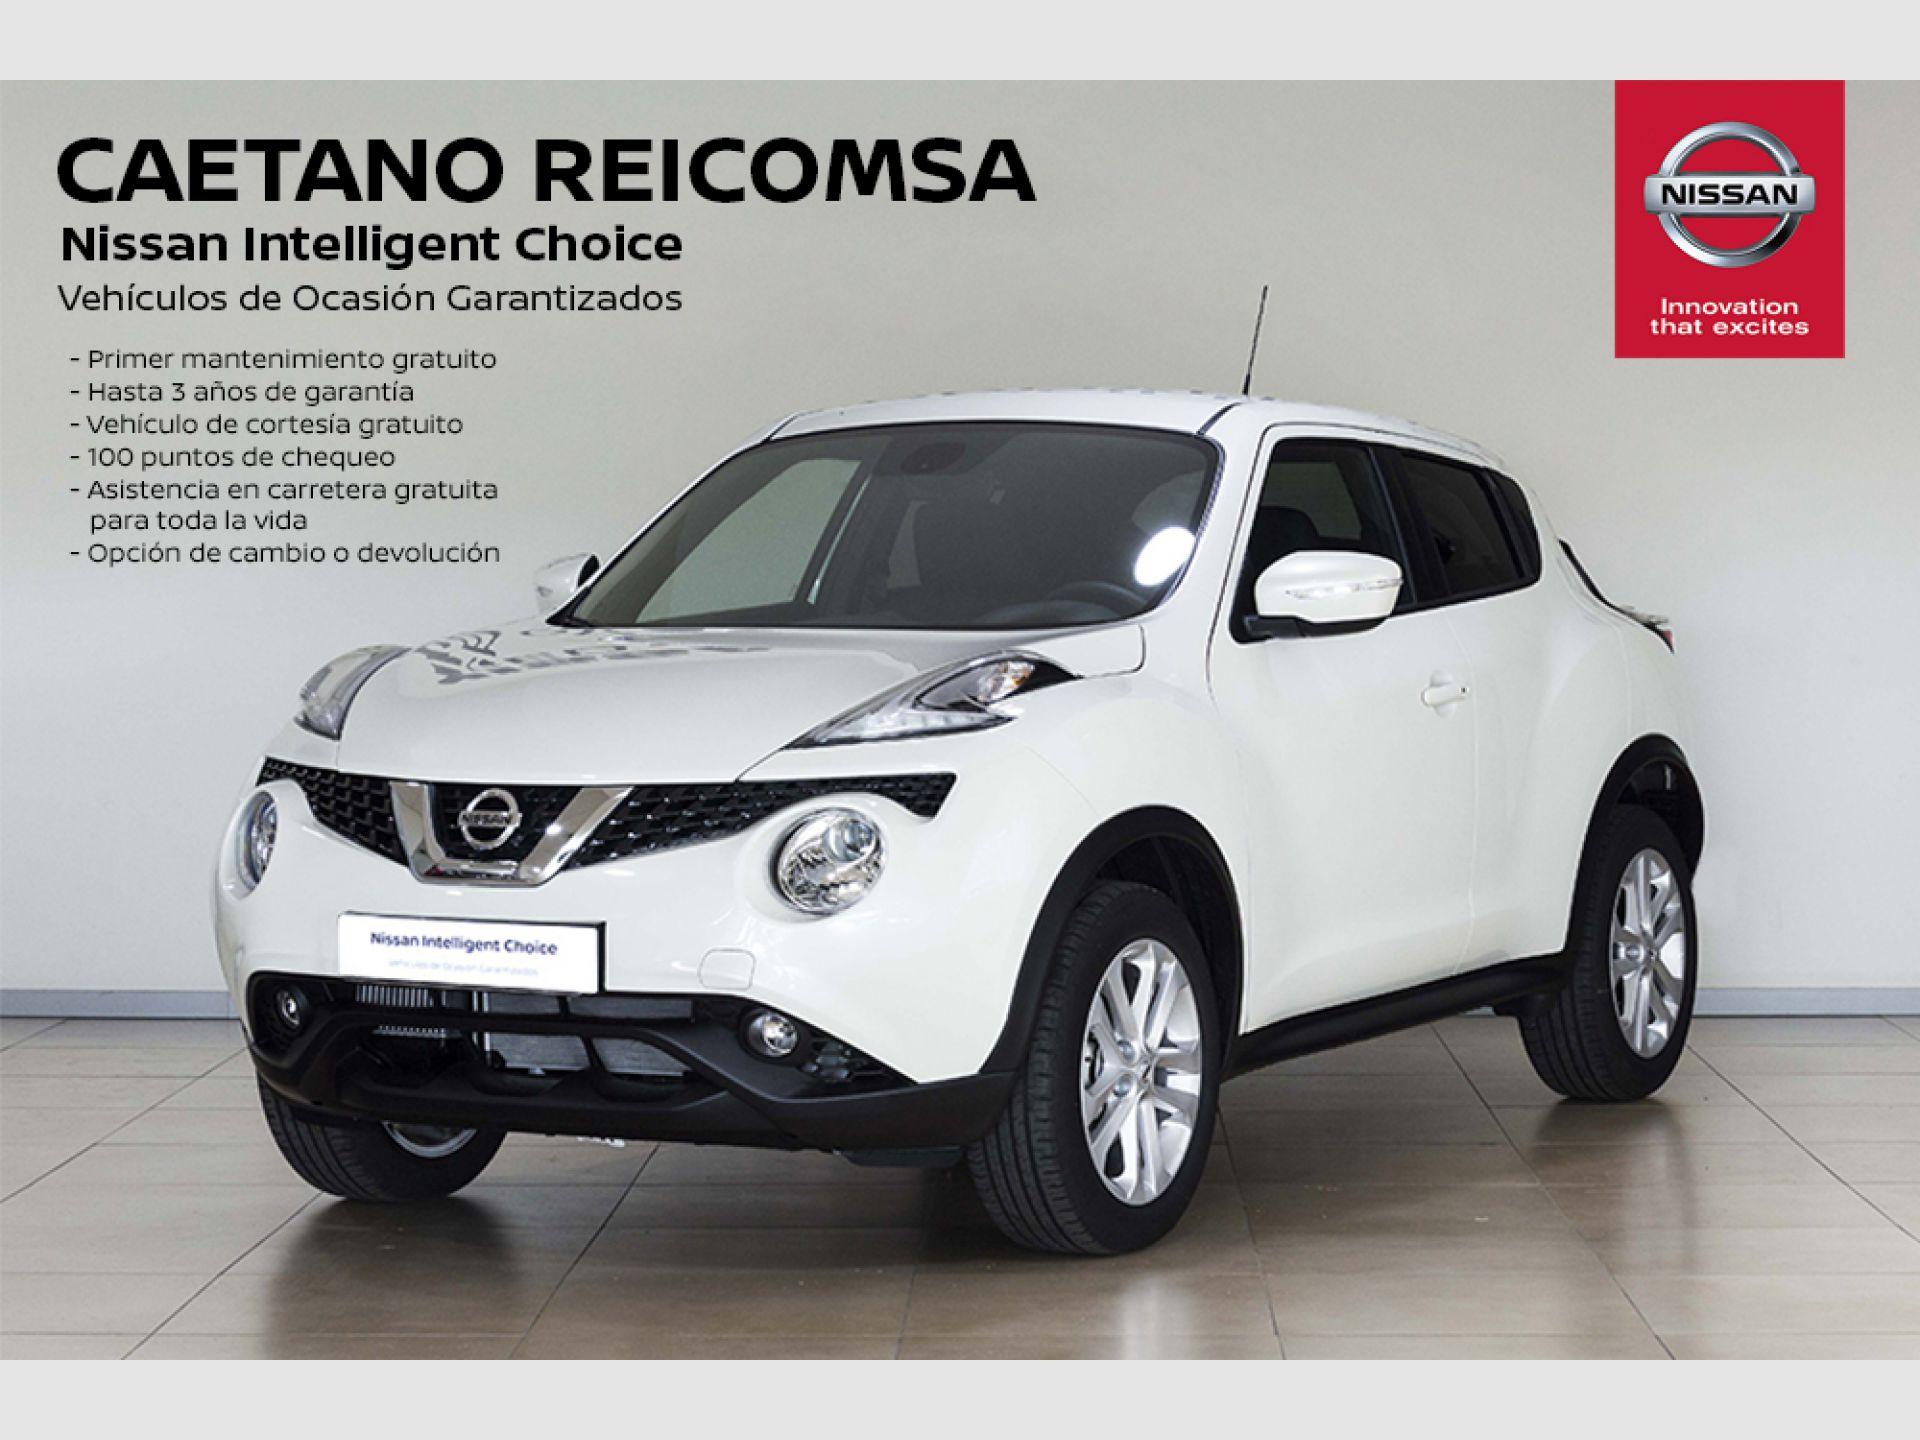 Nissan JUKE DIG-T EU6 85 kW (115 CV) 6M/T N-CONNECTA segunda mano Madrid